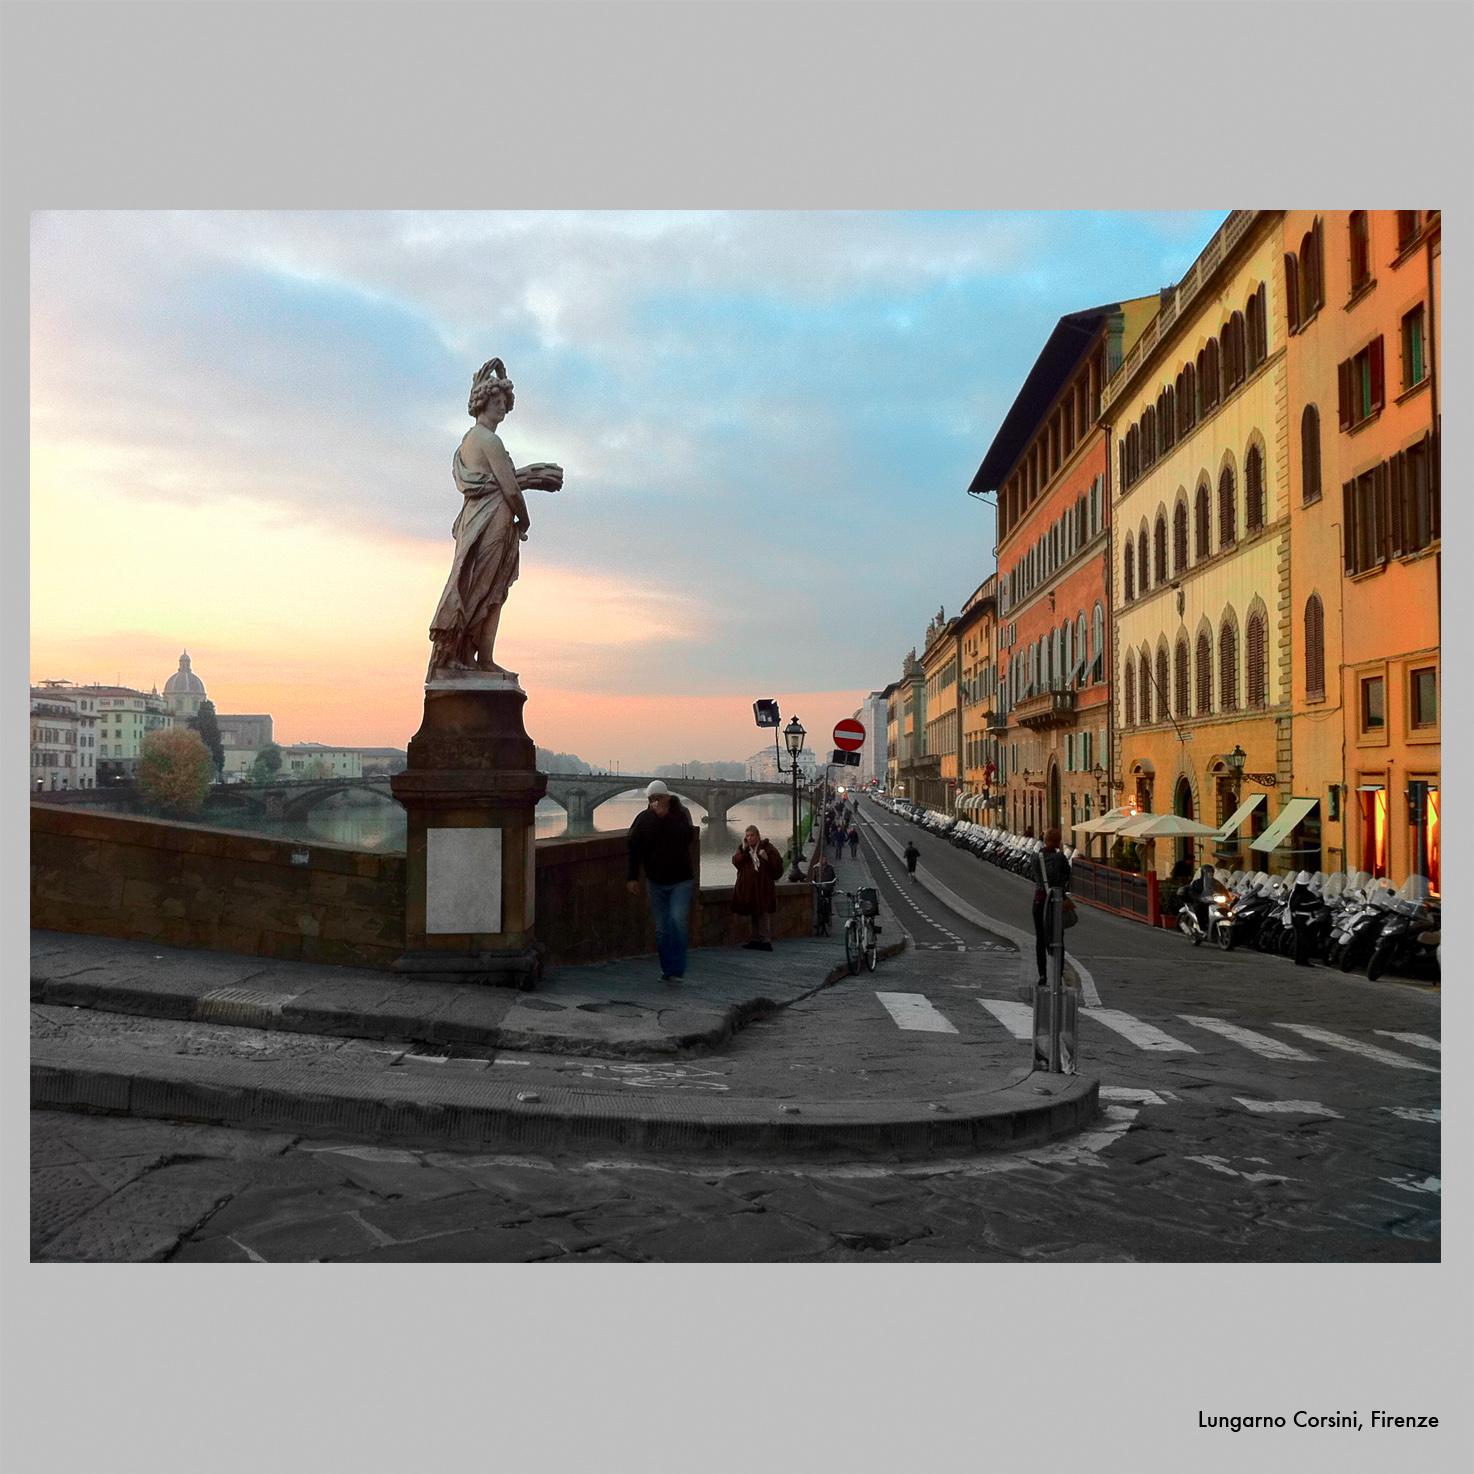 lungarno Corsini, Firenze.jpg